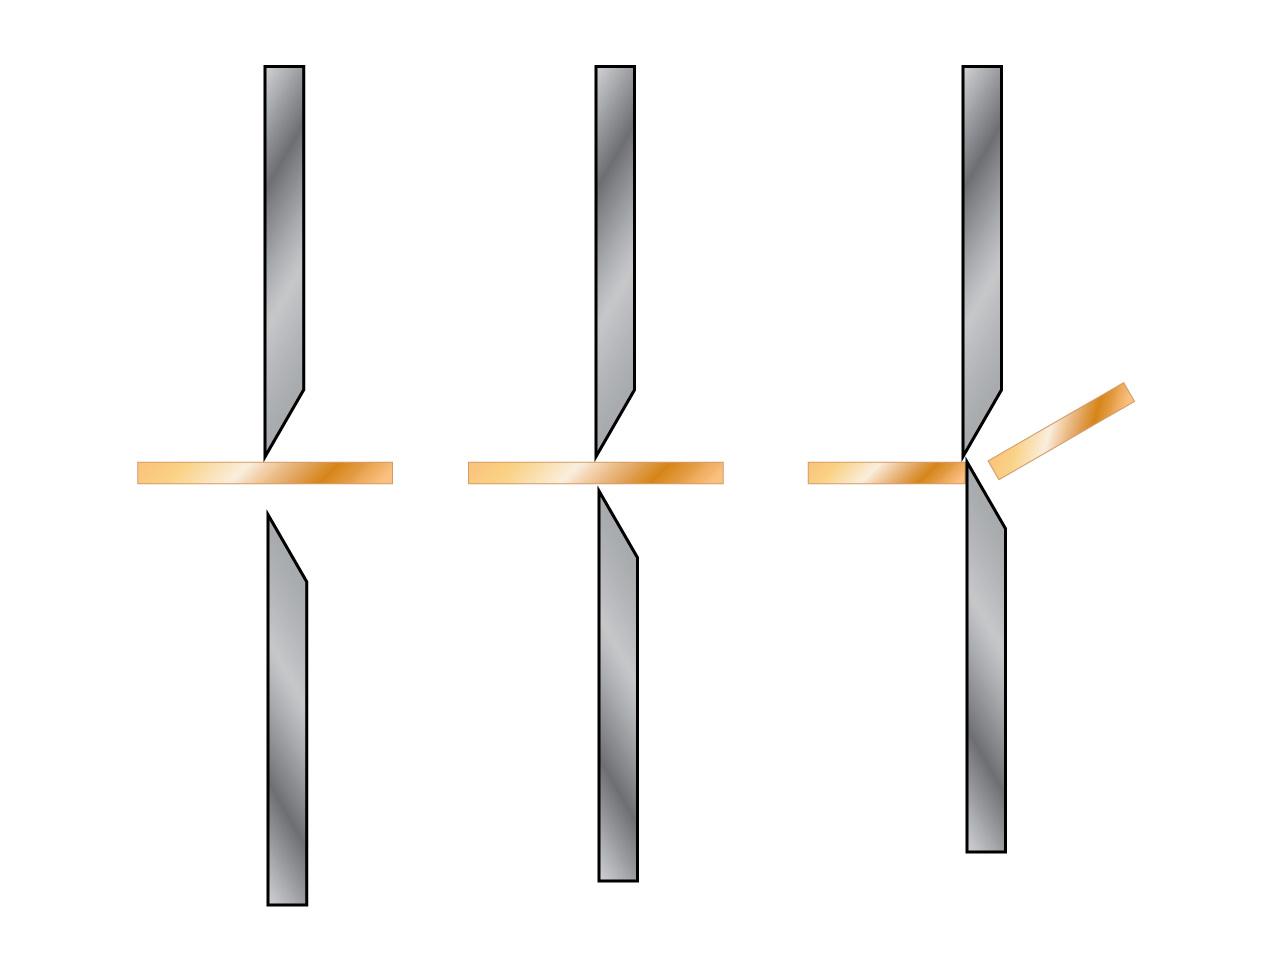 Xuron-Multi-Purpose-Pliers-Cutters-Shears-and-Scissors thumbnail 25